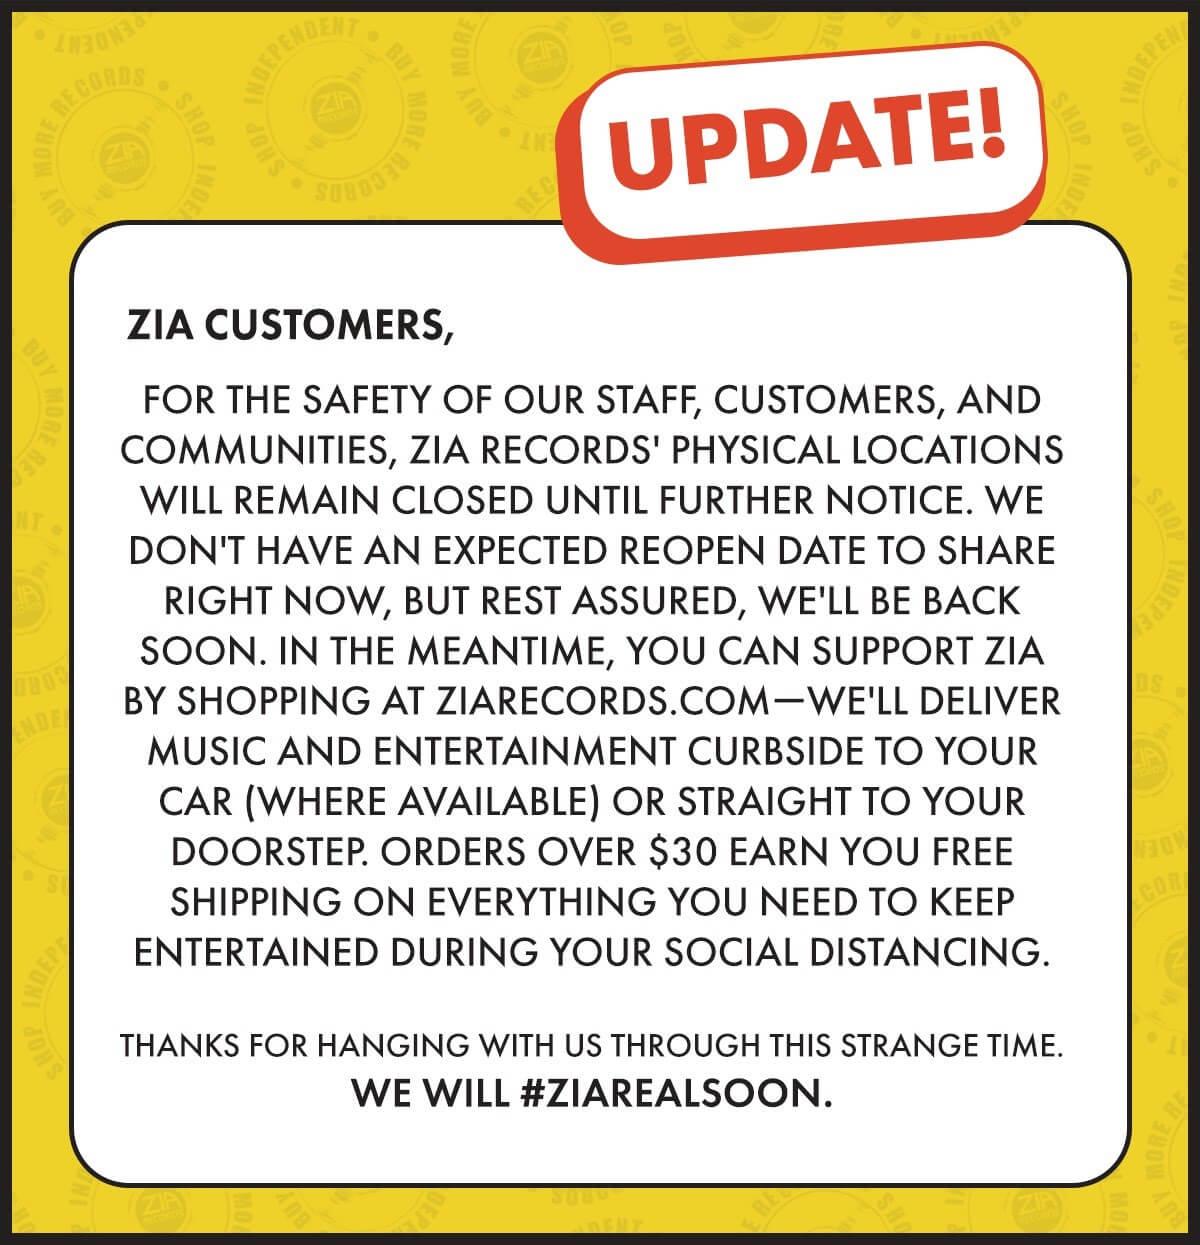 Zia Online only - Store Update 031720